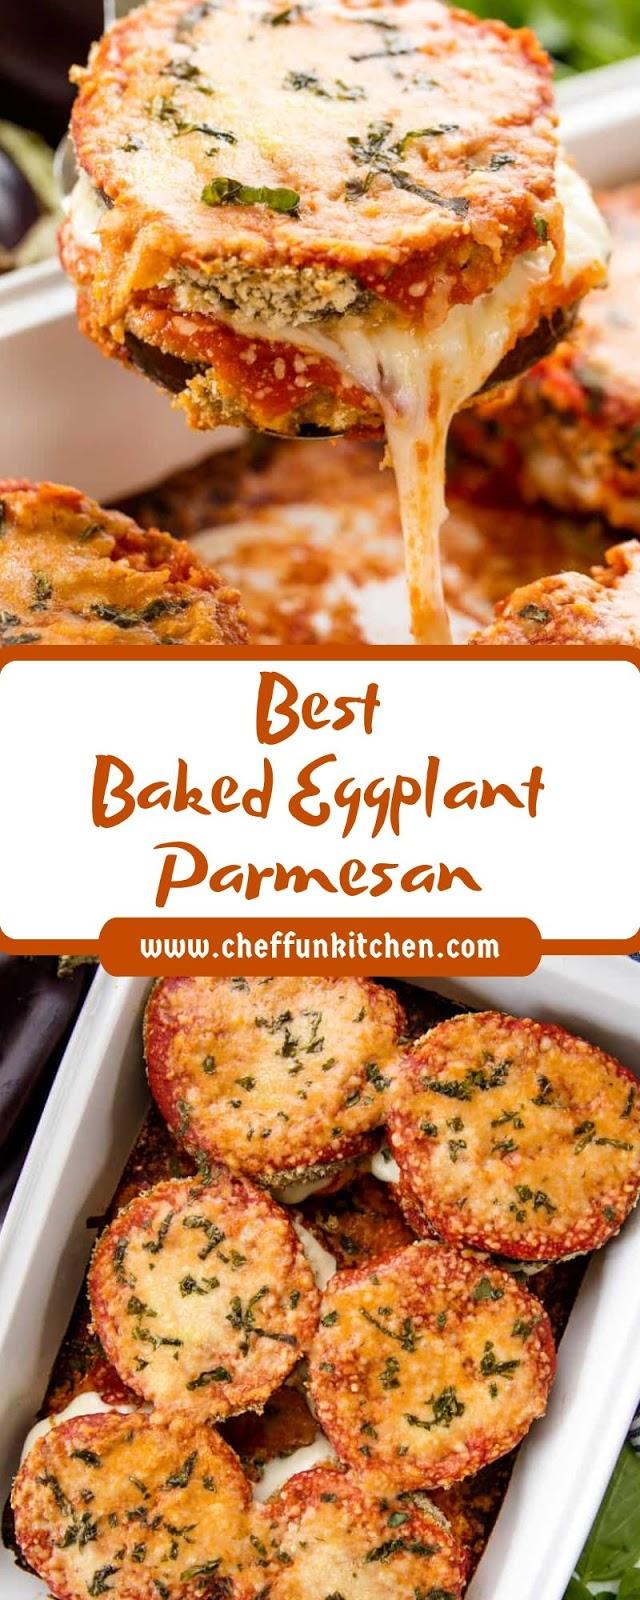 Best Baked Eggplant Parmesan